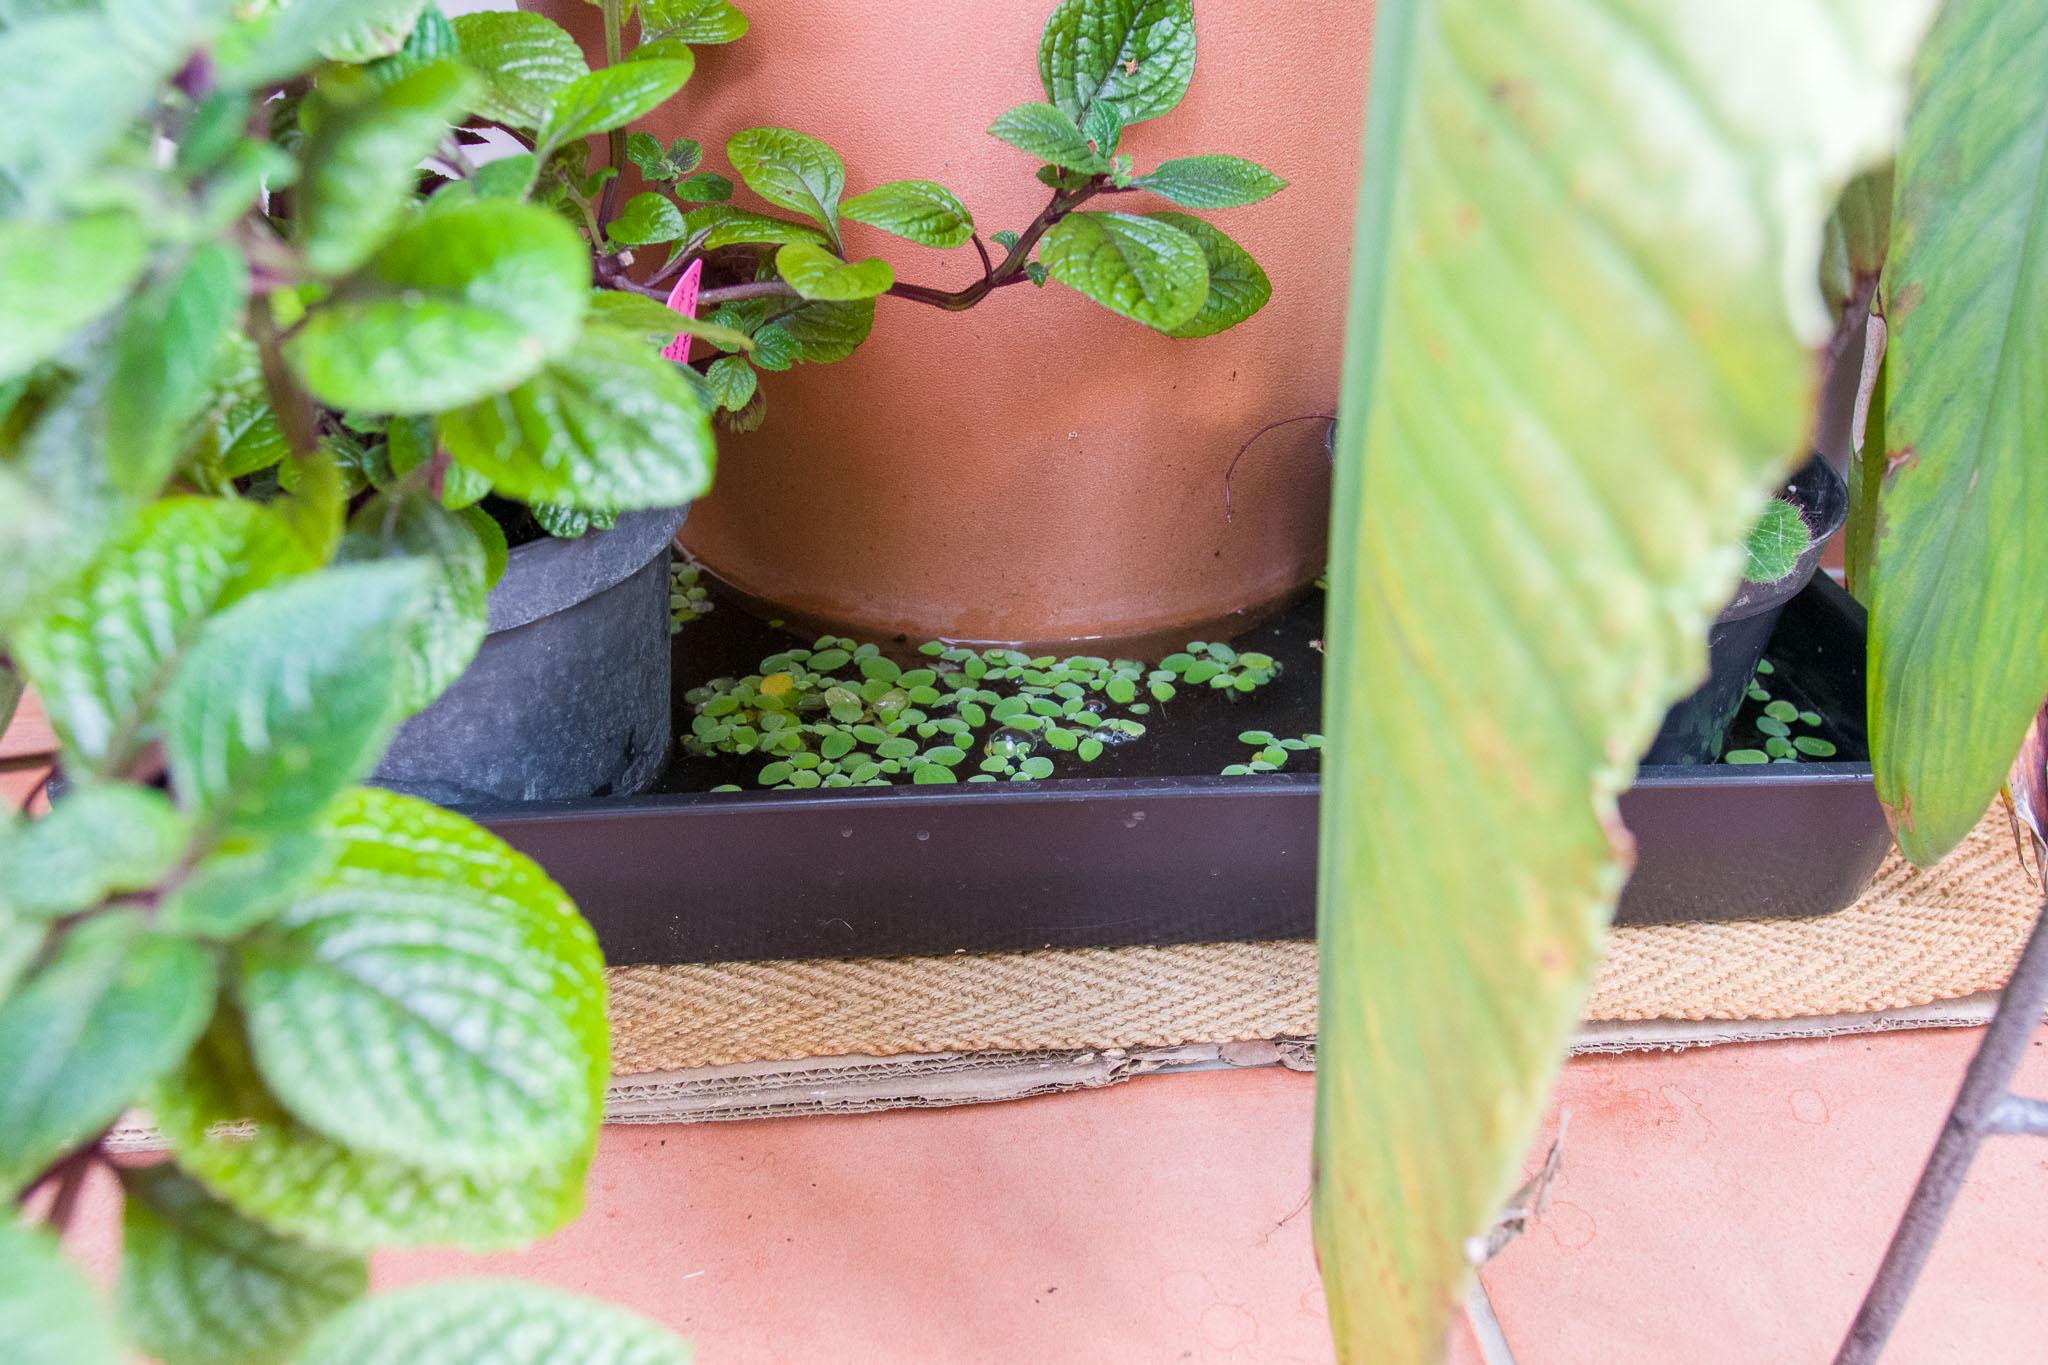 7th November - Water Lettuce Colony_IMGP6854.jpg